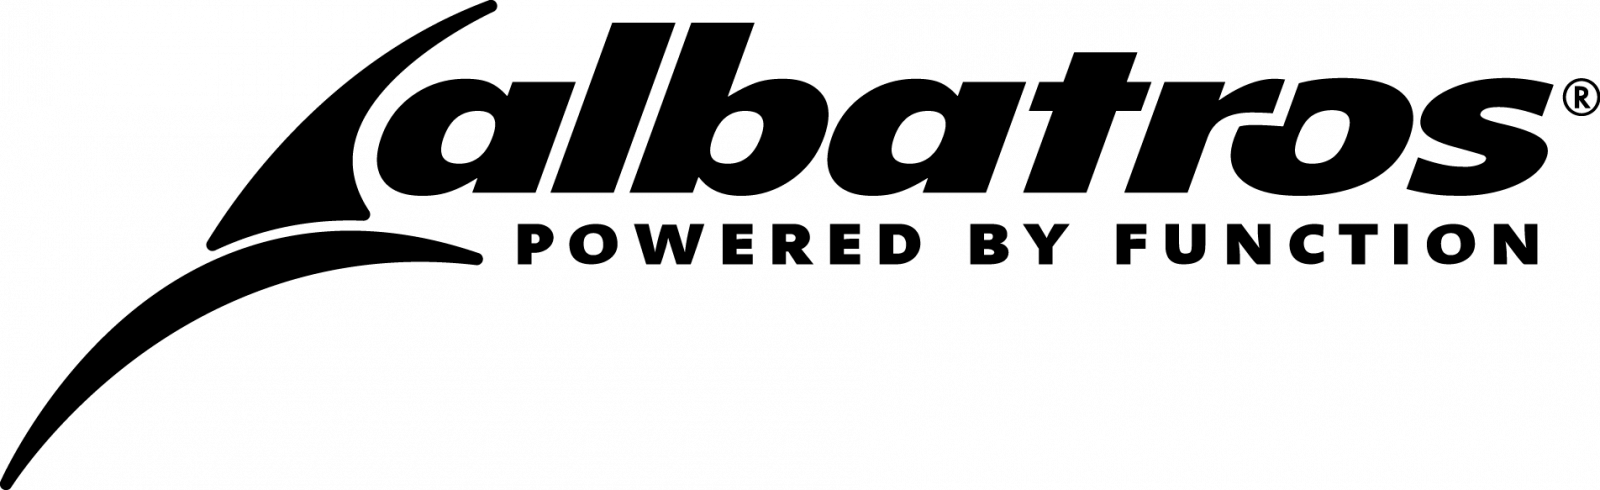 Albatros Strick-//Softshelljacke MAXWELL Blau//Schwarz 264460